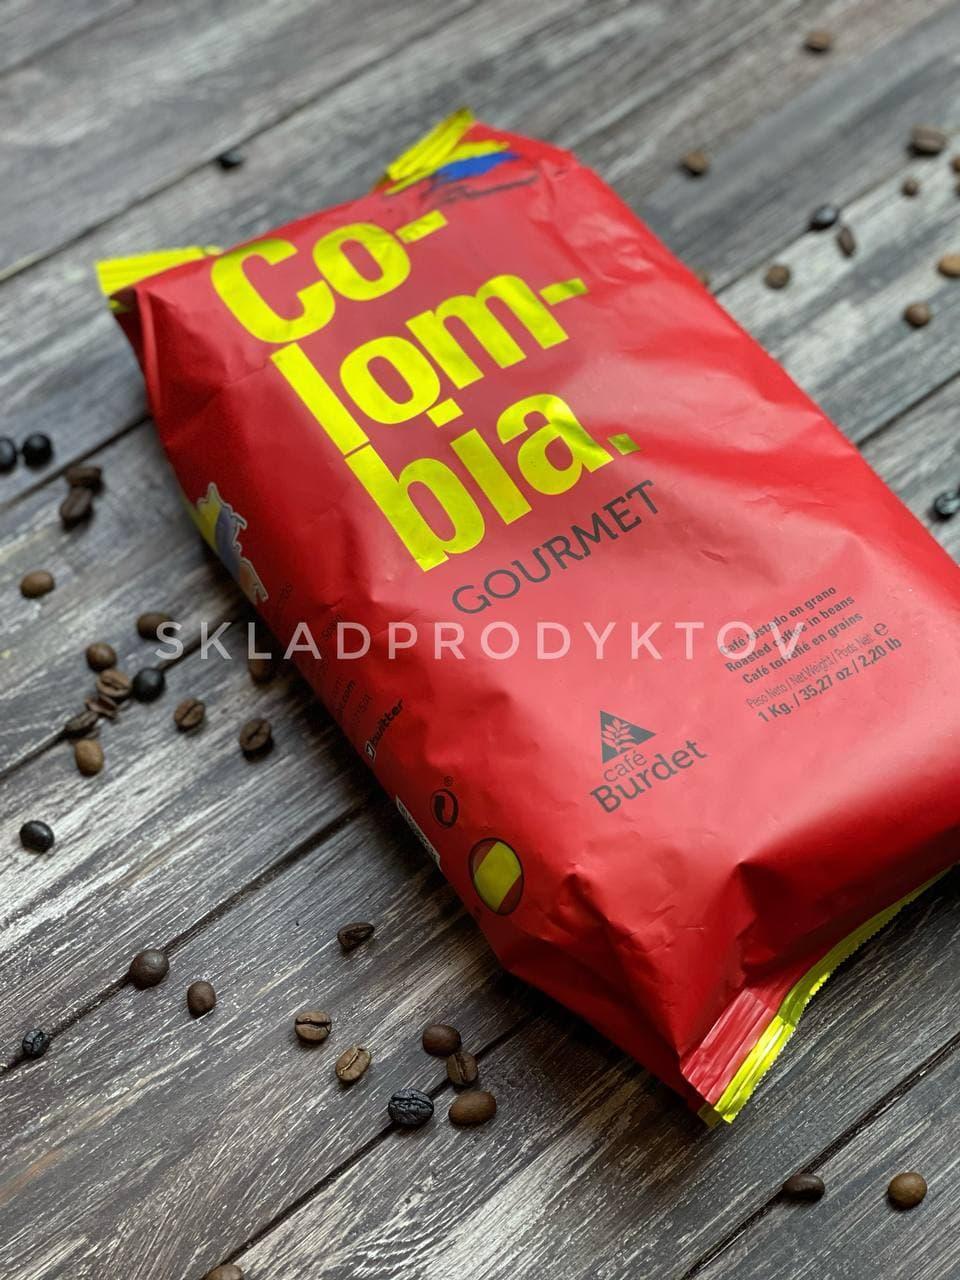 Кофе в зернах Colombia Courmet(красное) 1кг, 100% арабика Испания